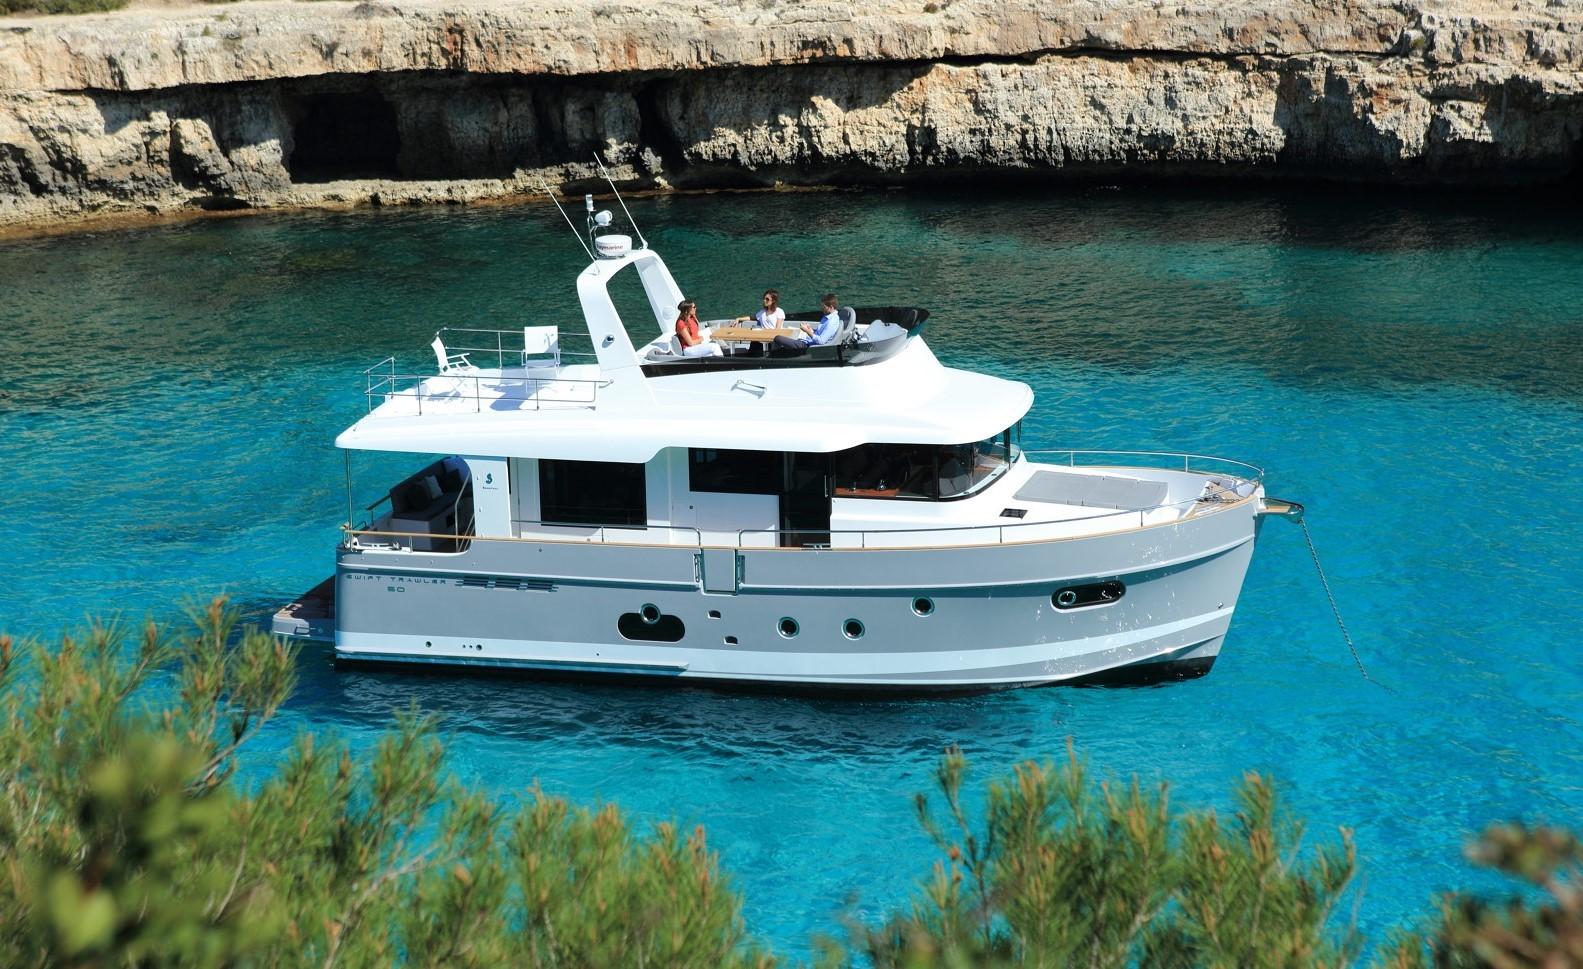 Beneteau Swift Trawler 50 Beneteau Swift Trawler 50